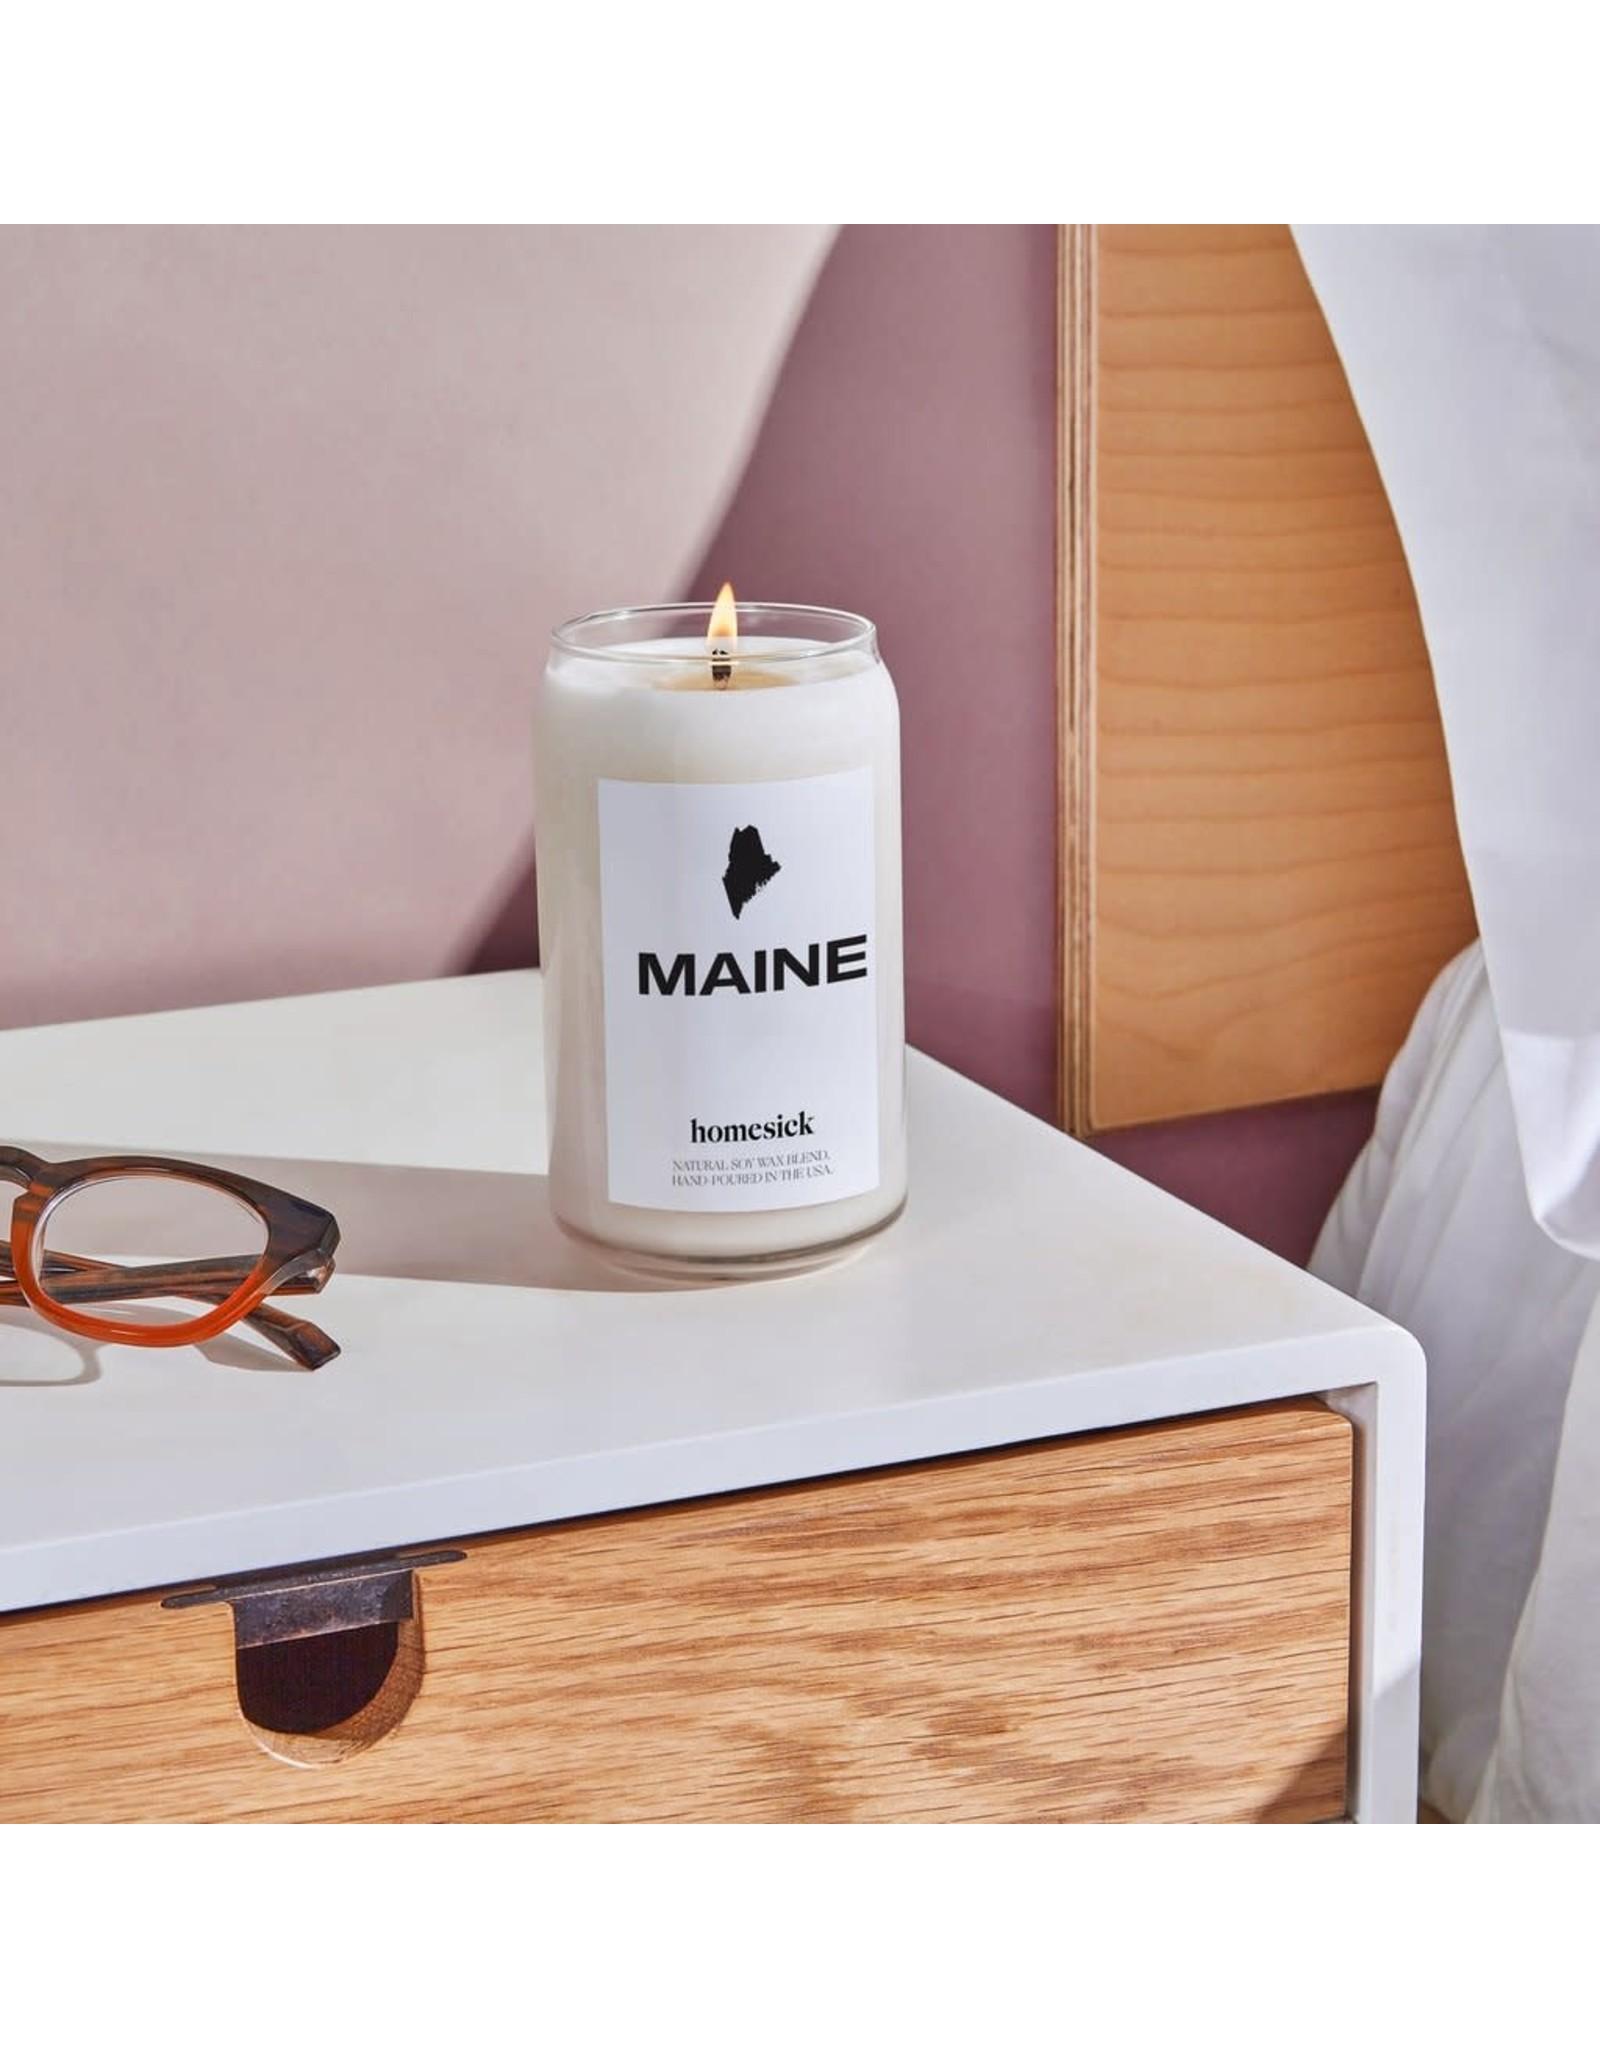 Homesick Maine Candle